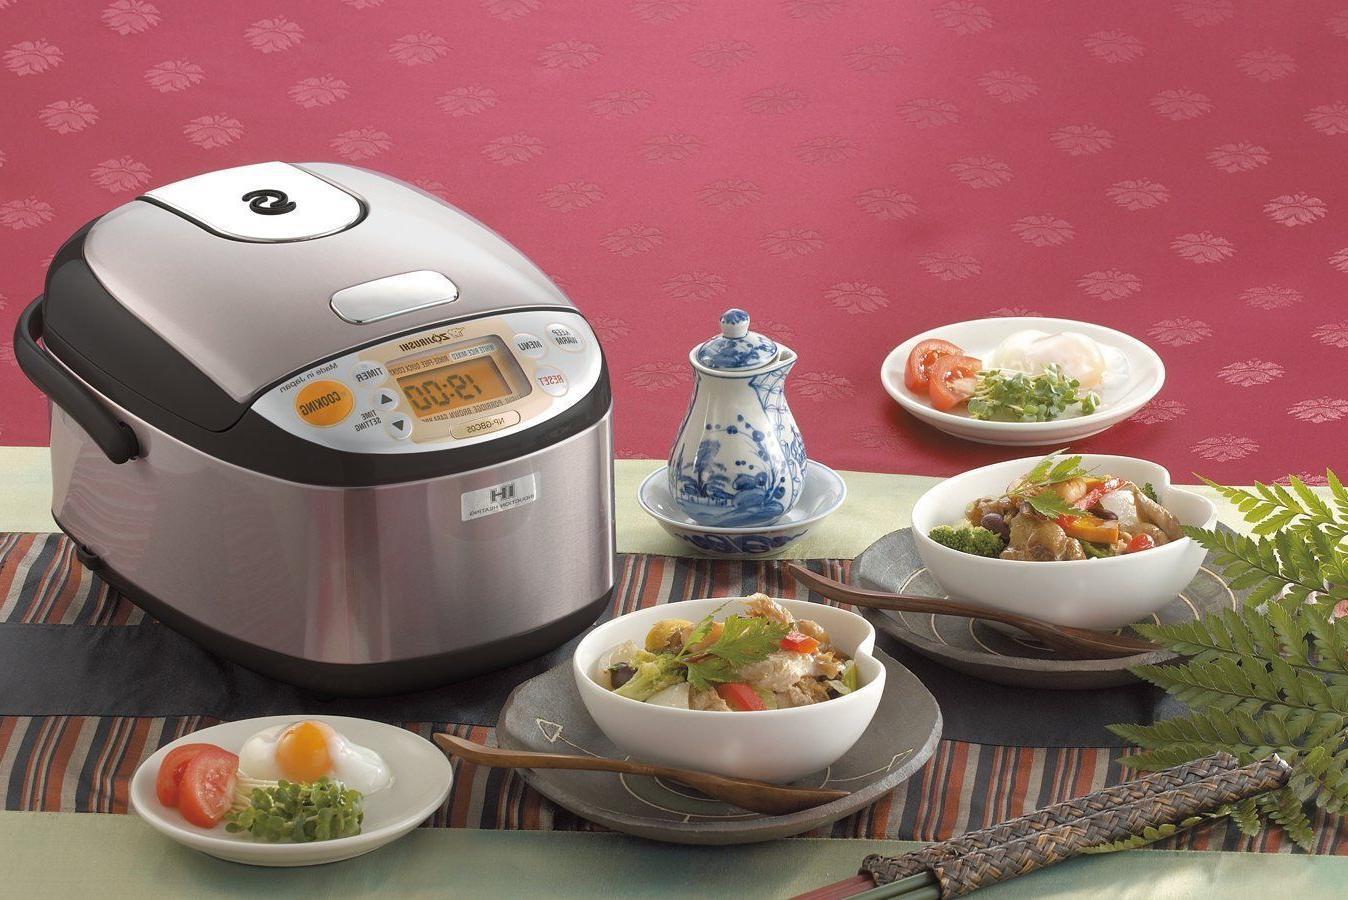 Zojirushi NP-GBC05-XT Heating System Rice & Warmer GIFT*